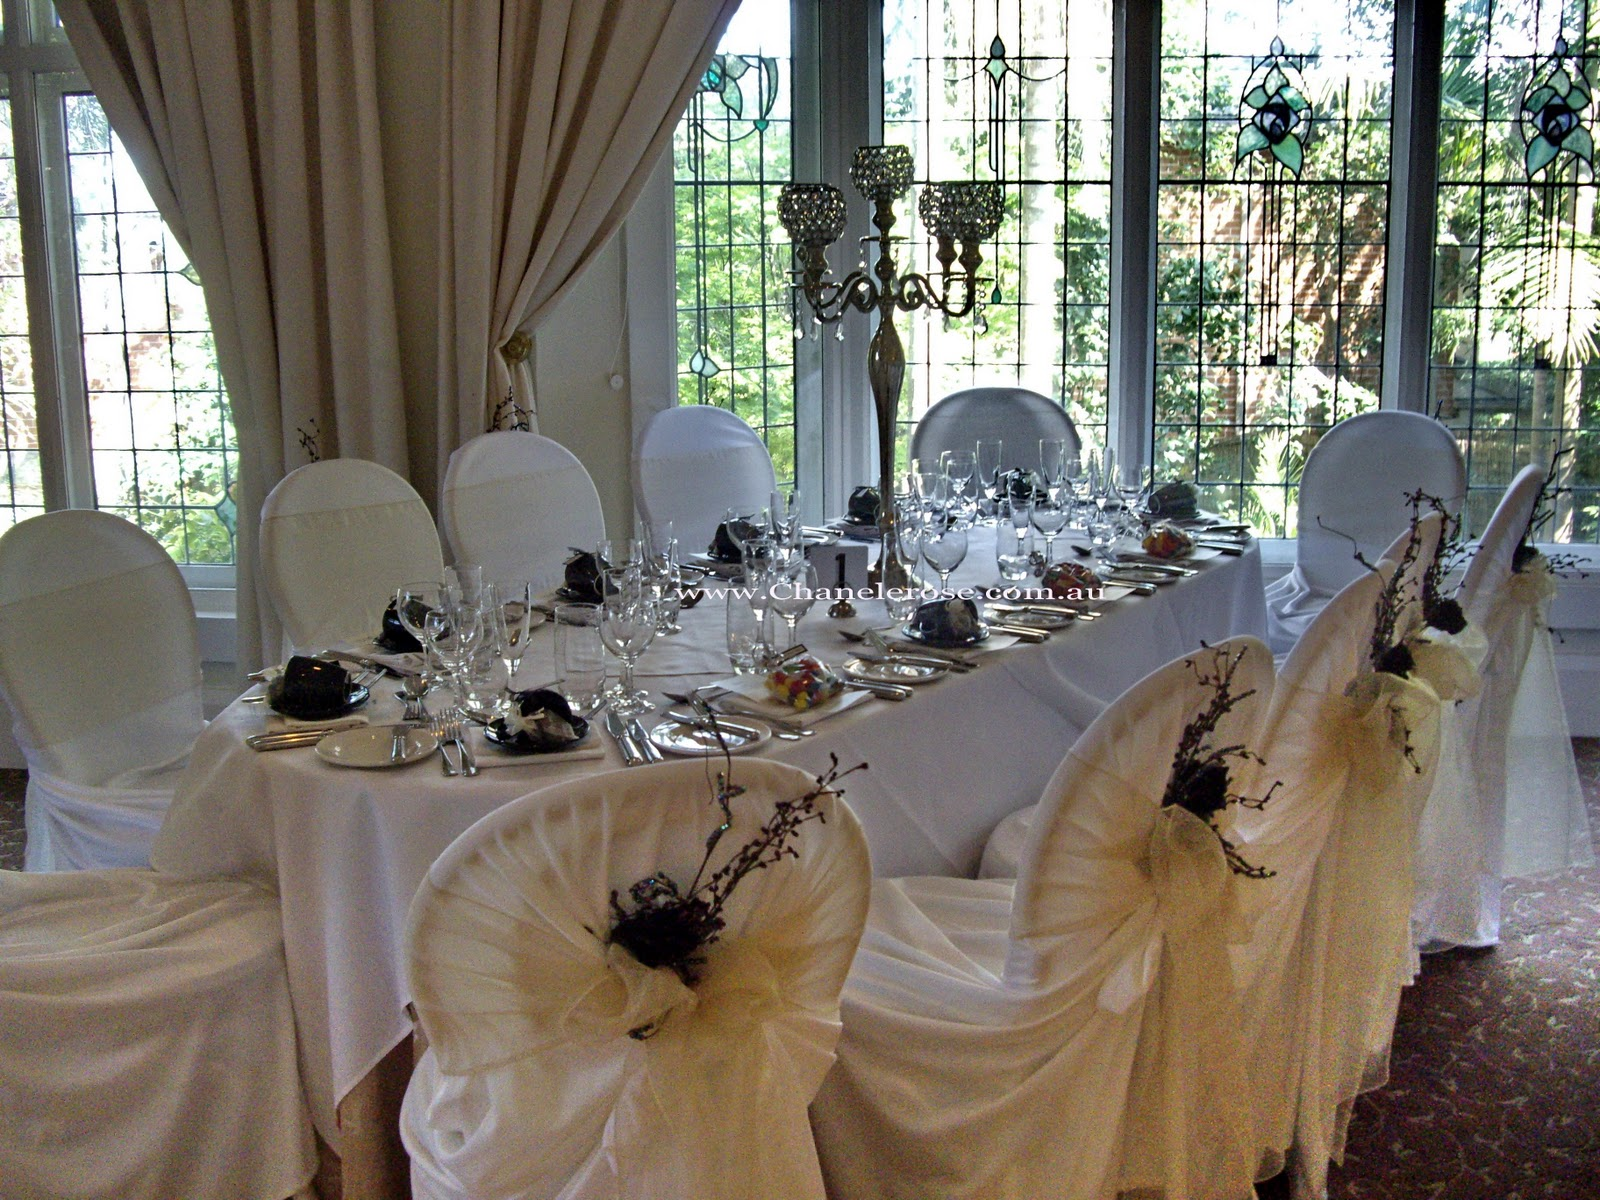 wedding chair covers sydney childcare glider rocker ottoman review chanele rose flowers blog stylist